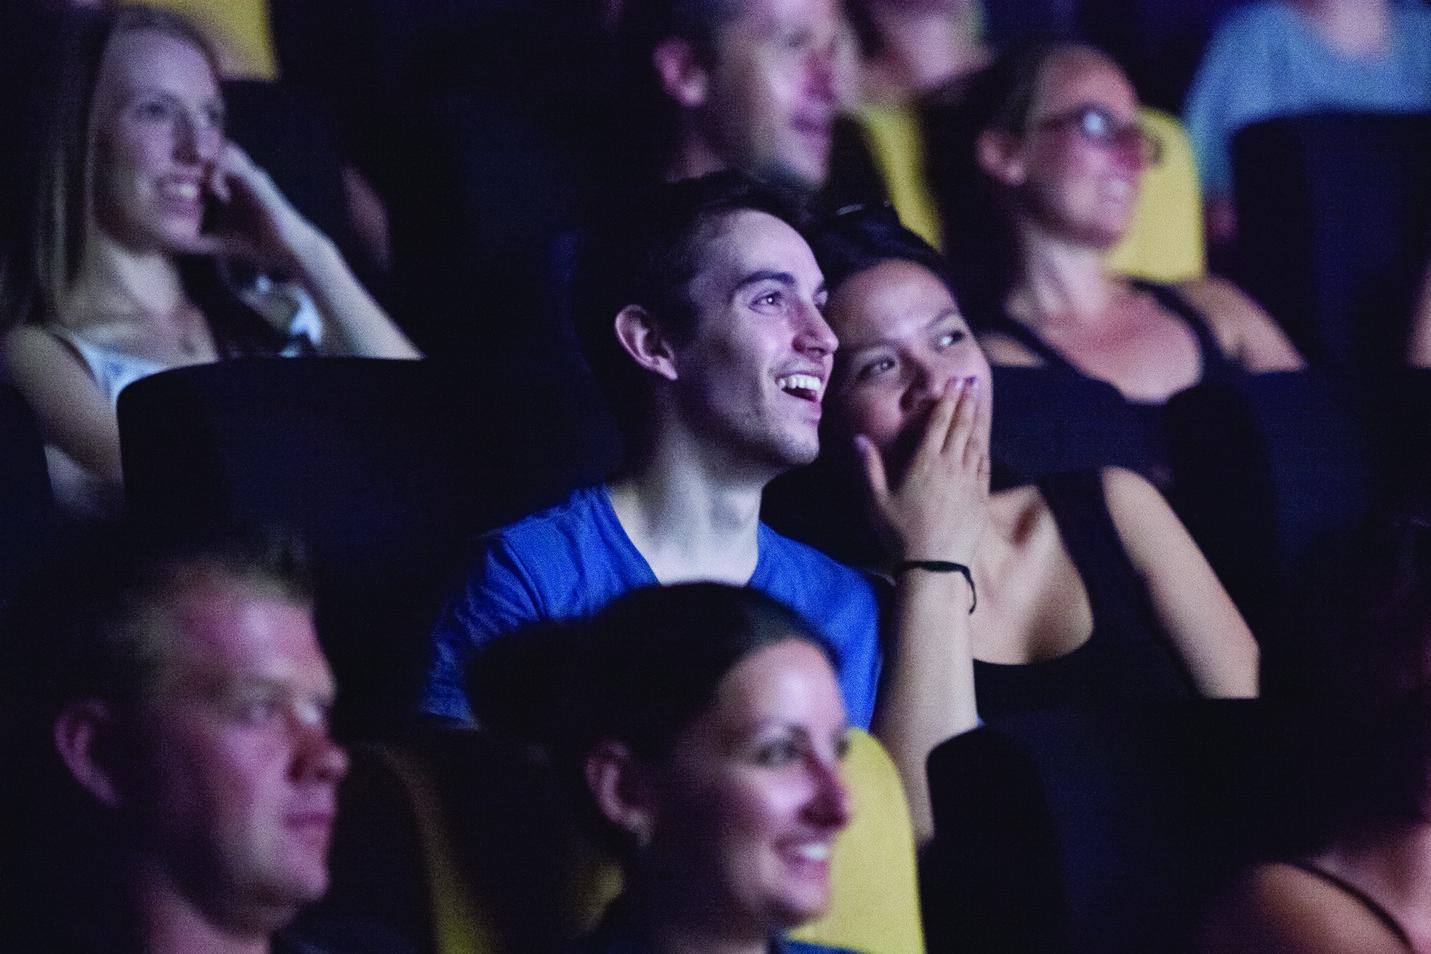 ACMI White Night 2013 - a couple watches a film -  Image Mark Gambino.jpg